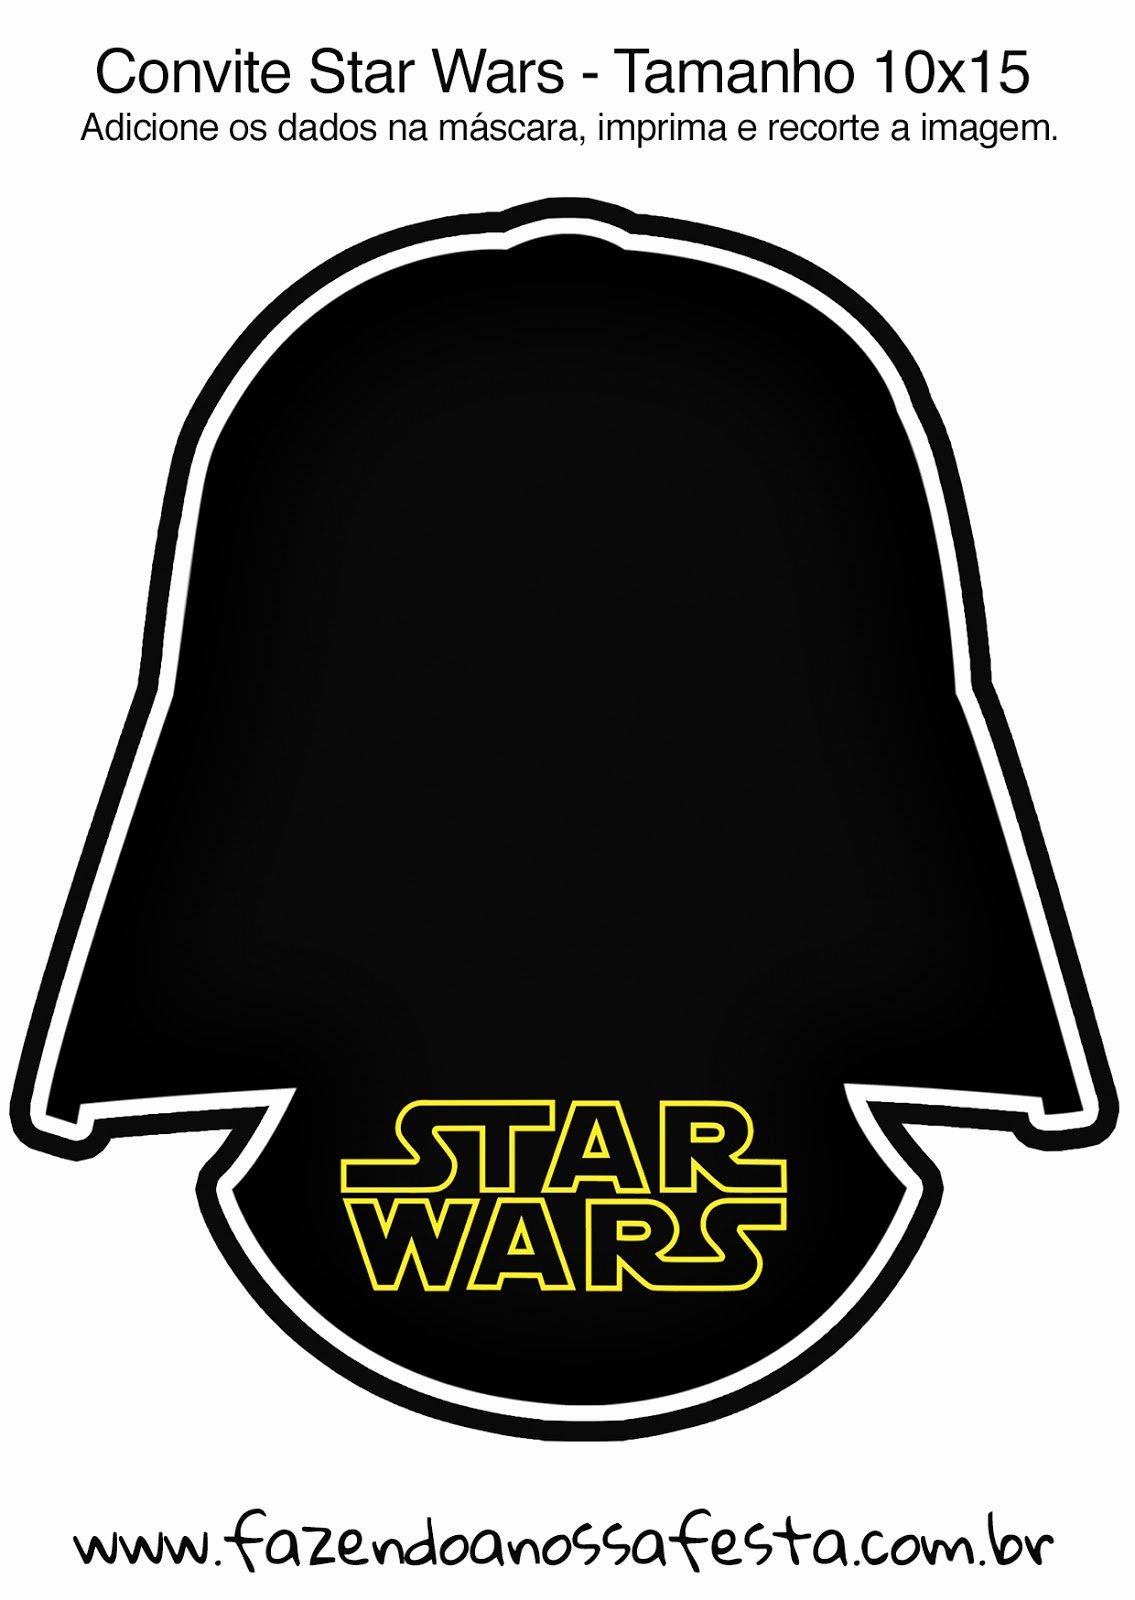 Star Wars Invitations Free New Star Wars Free Printable Invitations Oh My Fiesta for